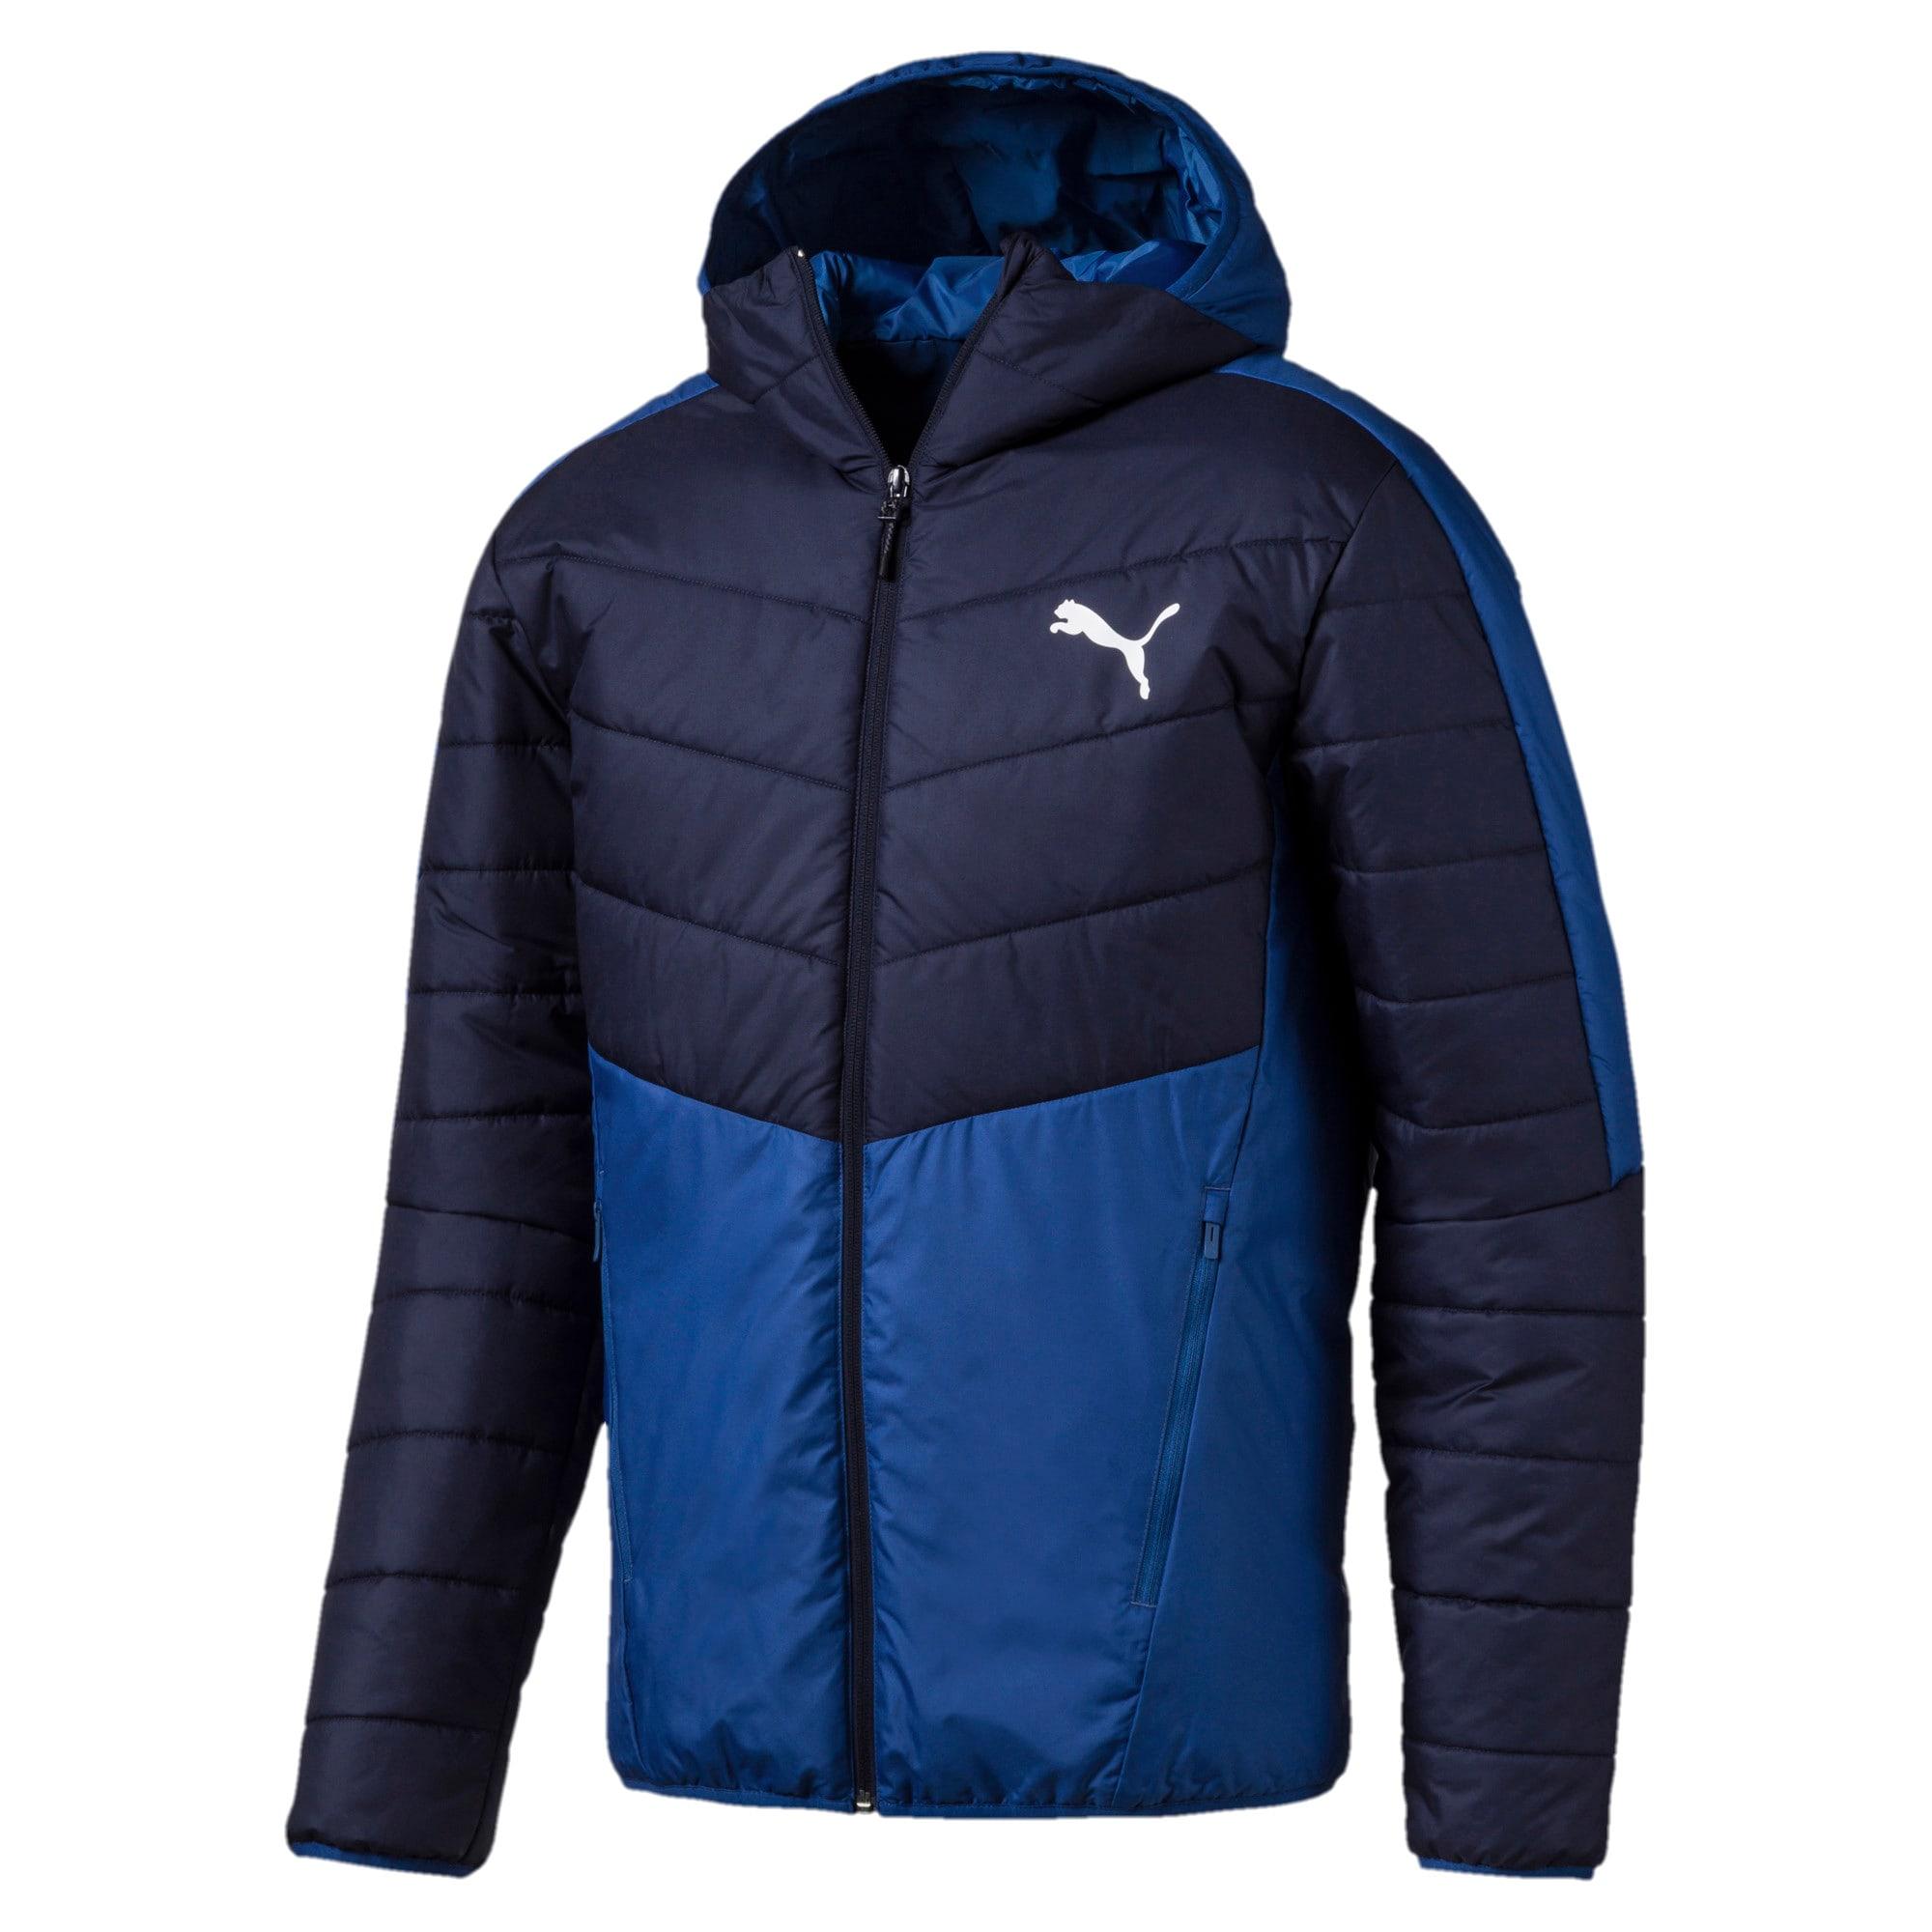 Thumbnail 1 of warmCELL Men's Padded Jacket, Galaxy Blue-Peacoat, medium